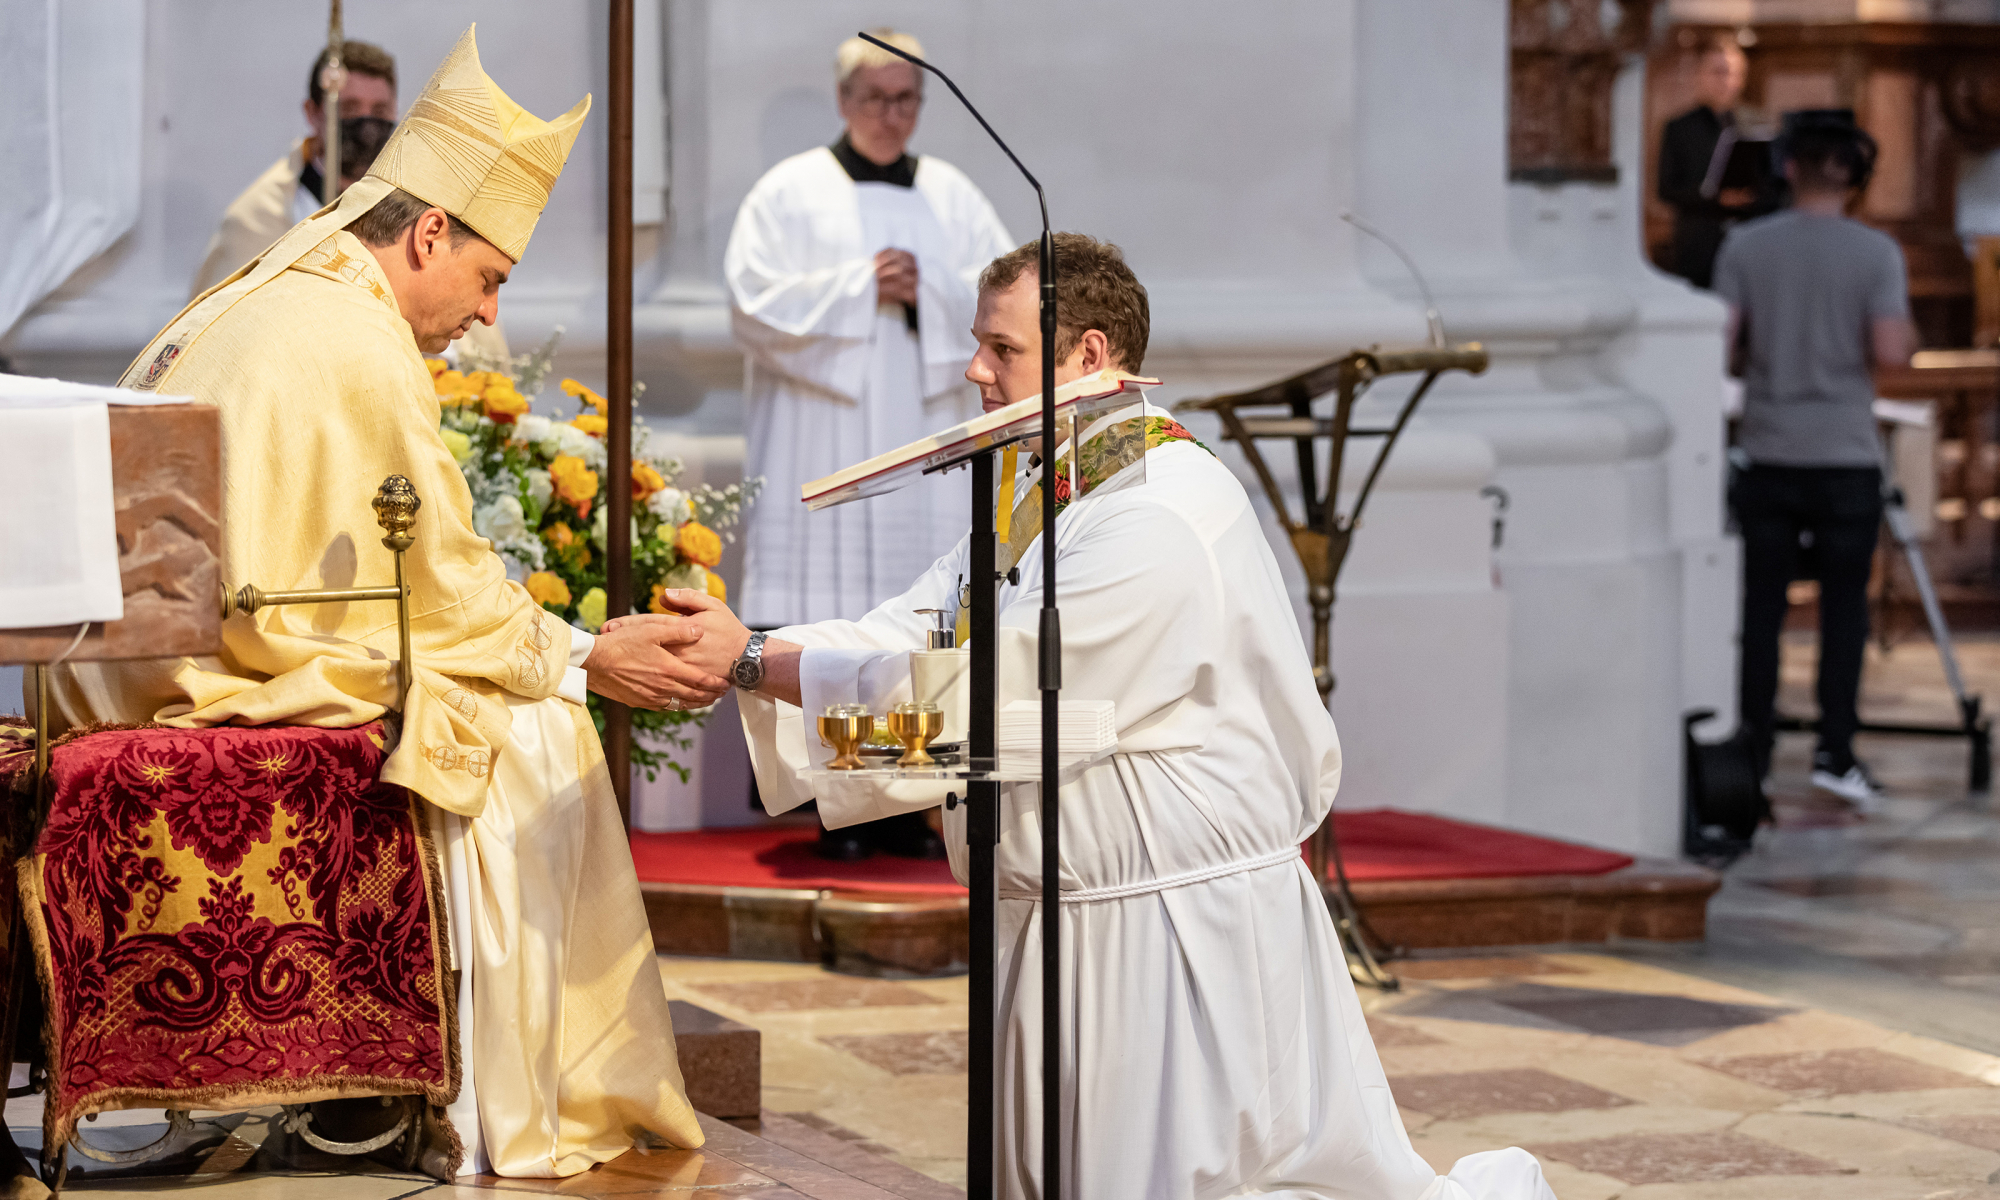 200627 Priesterweihe foto1 Simona Kehl